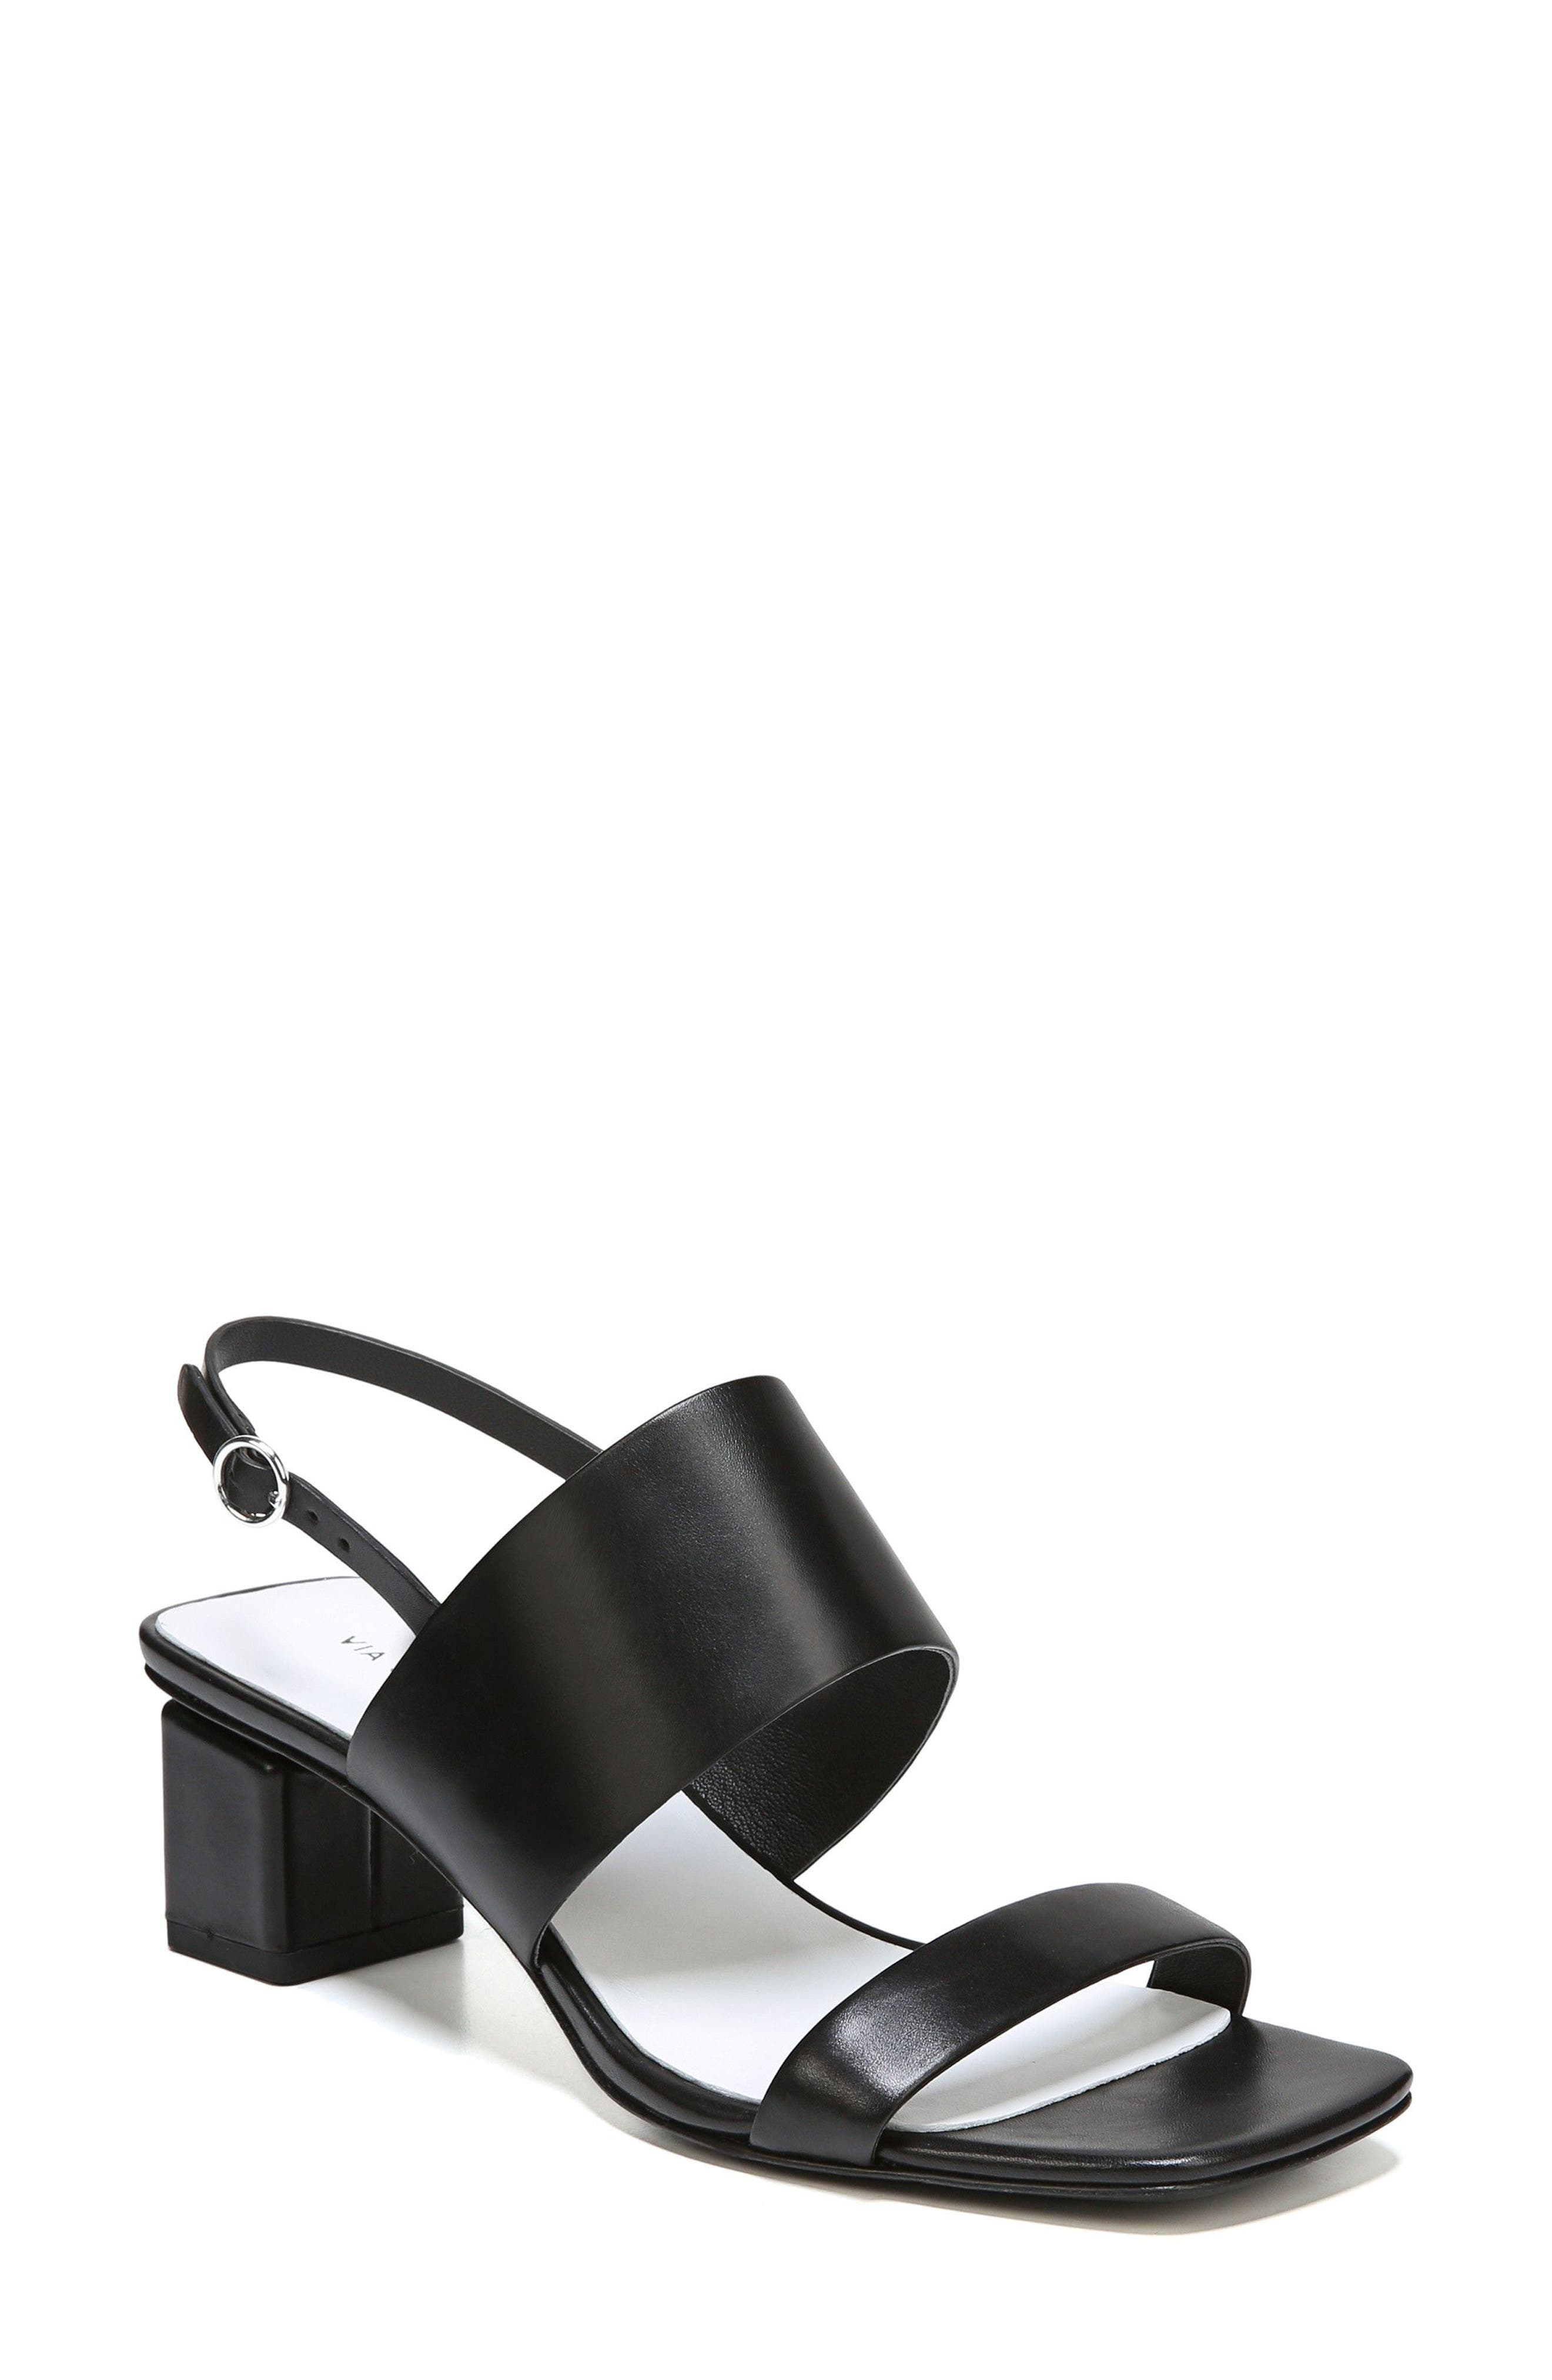 Forte Block Heel Sandal,                             Main thumbnail 1, color,